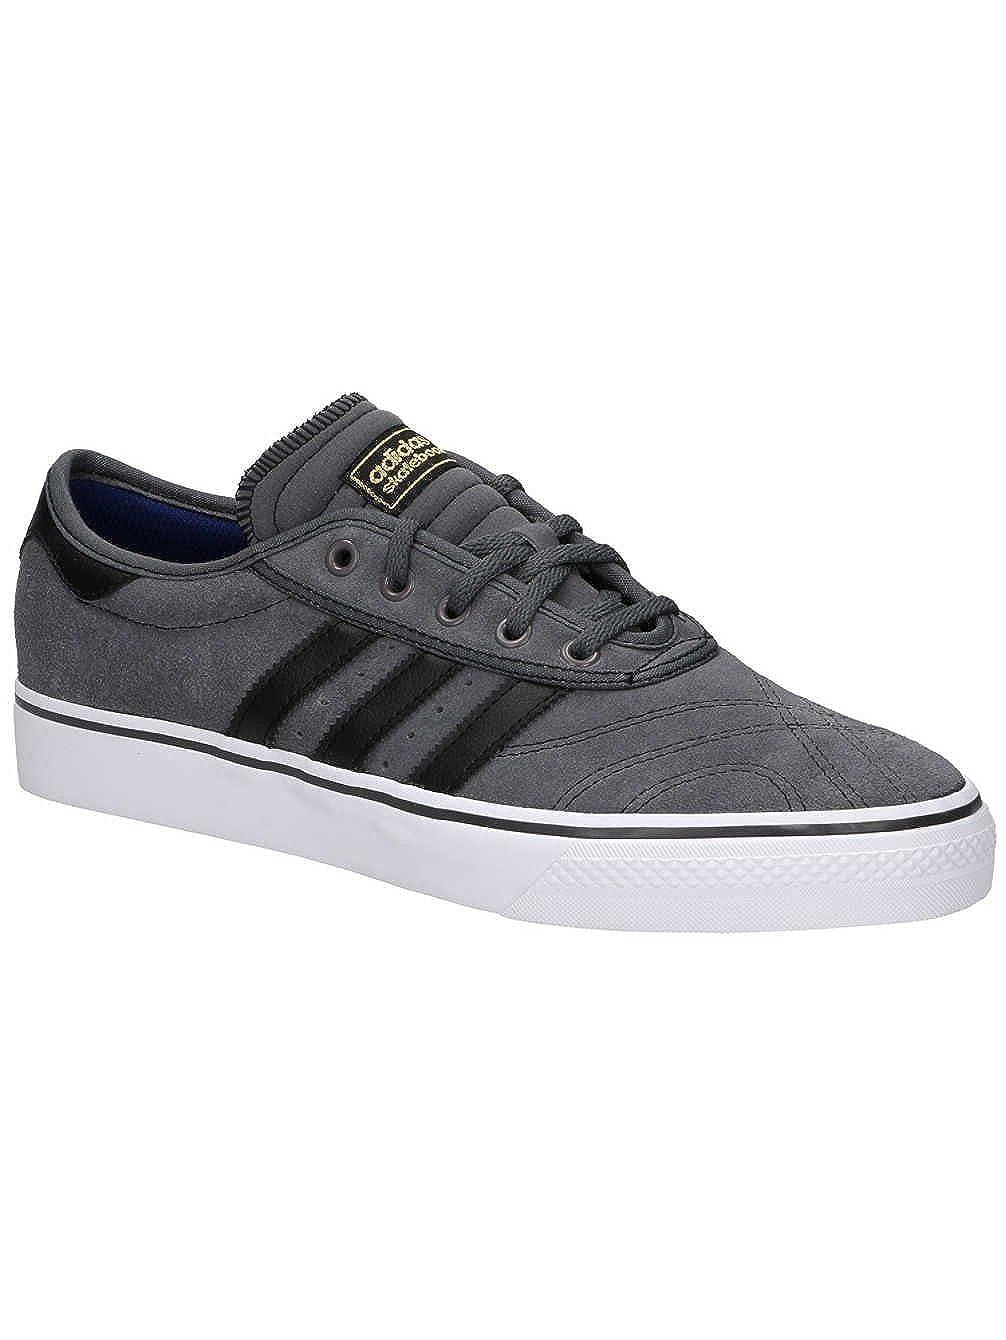 435cb3989d30 adidas Men s Adi-Ease Premiere Skateboarding Shoes Black  Amazon.co.uk   Shoes   Bags